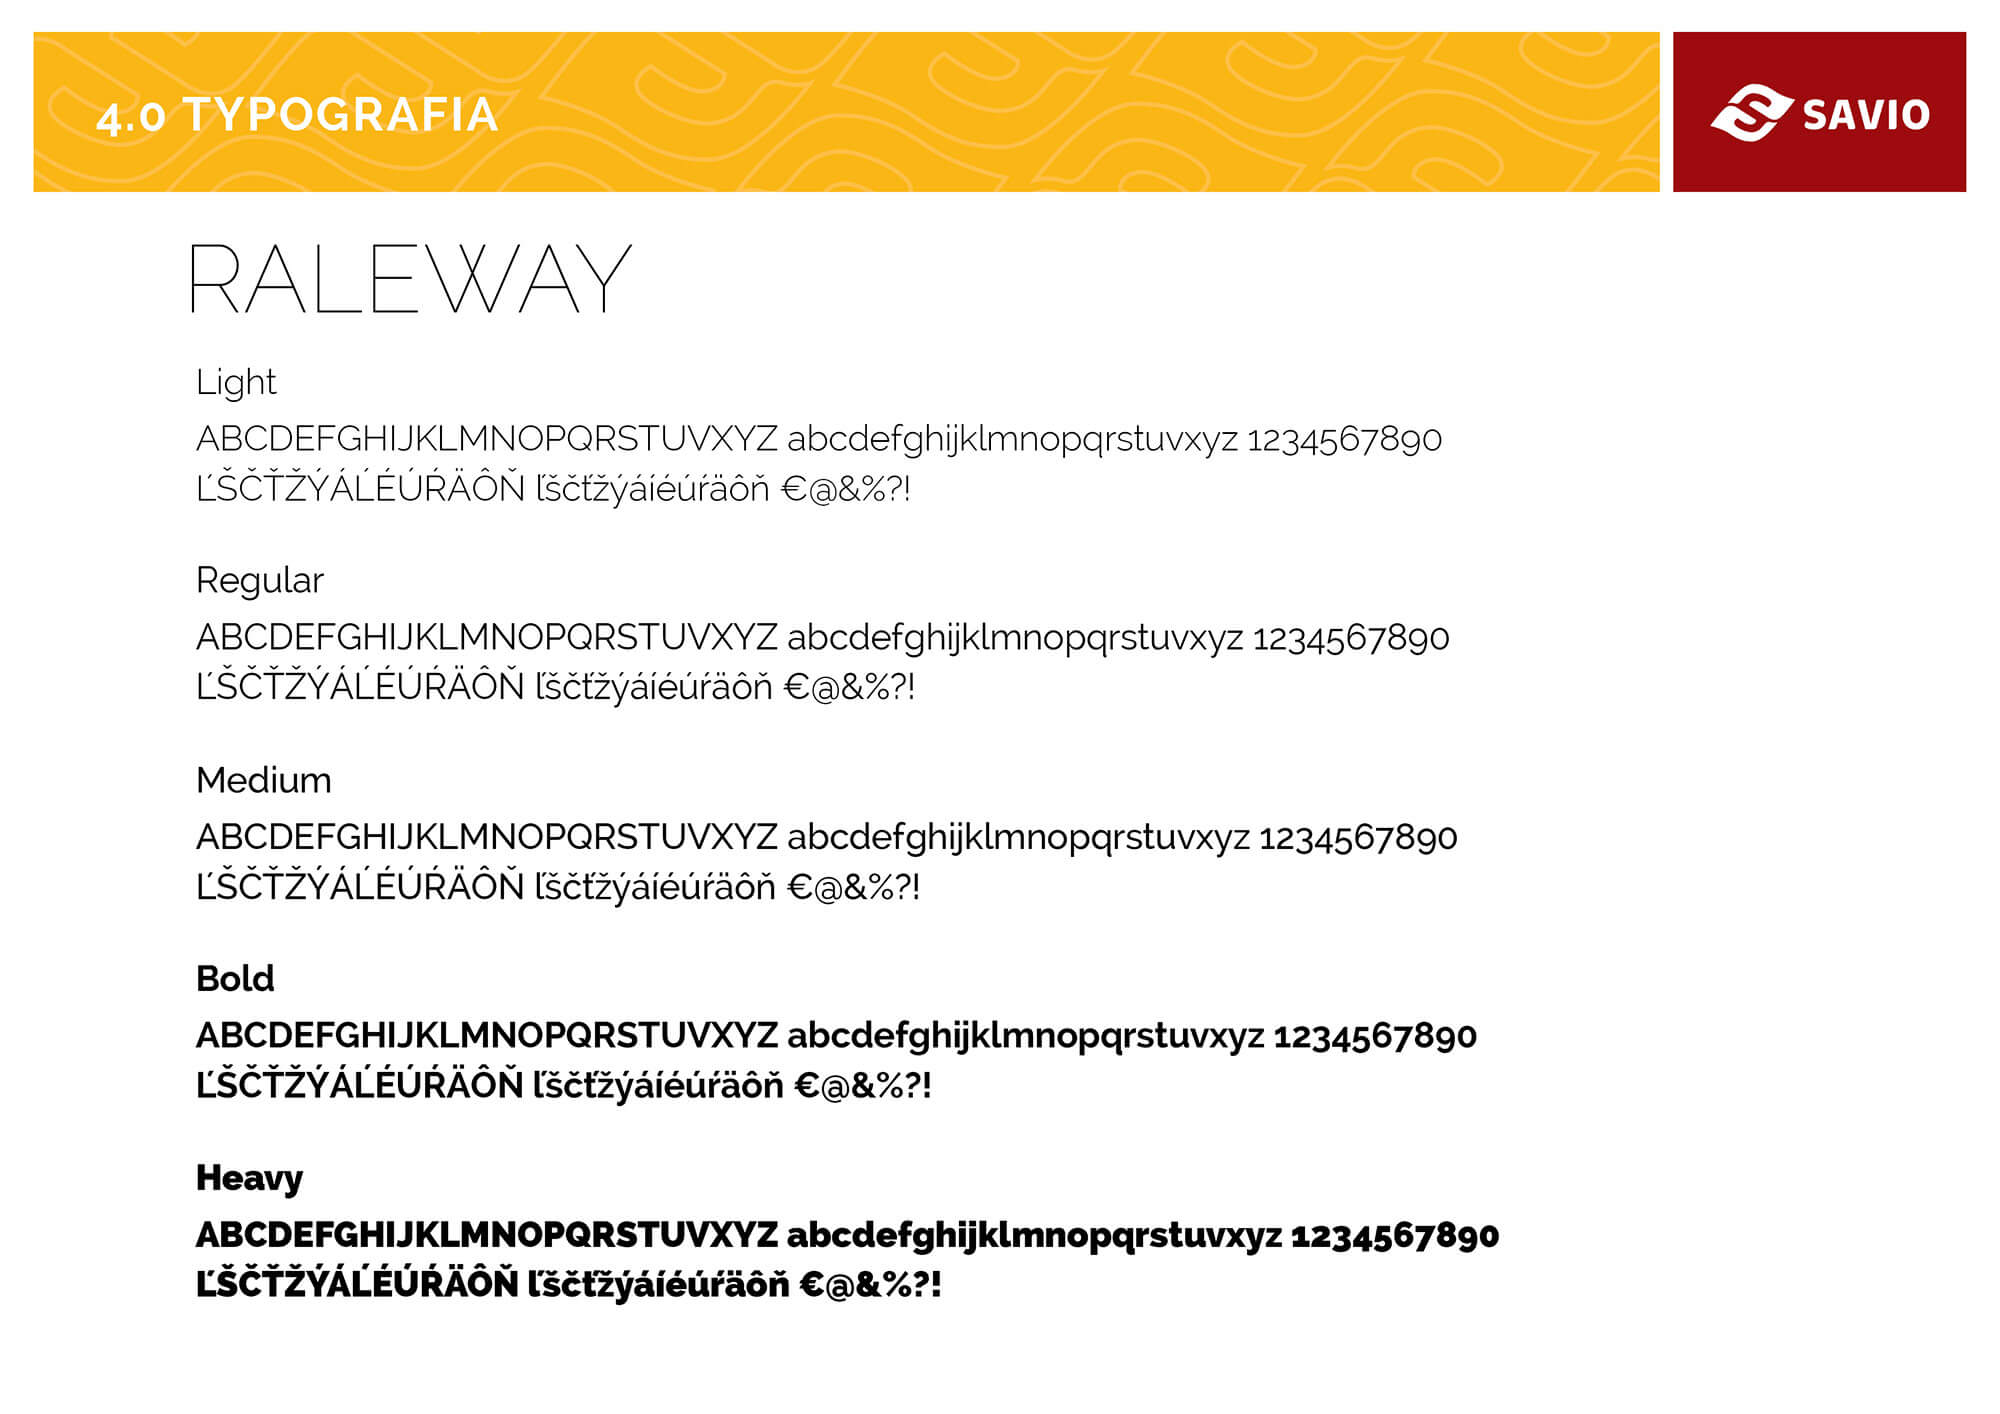 SAV-04-Strategia-CI-web-design-manual-v0210